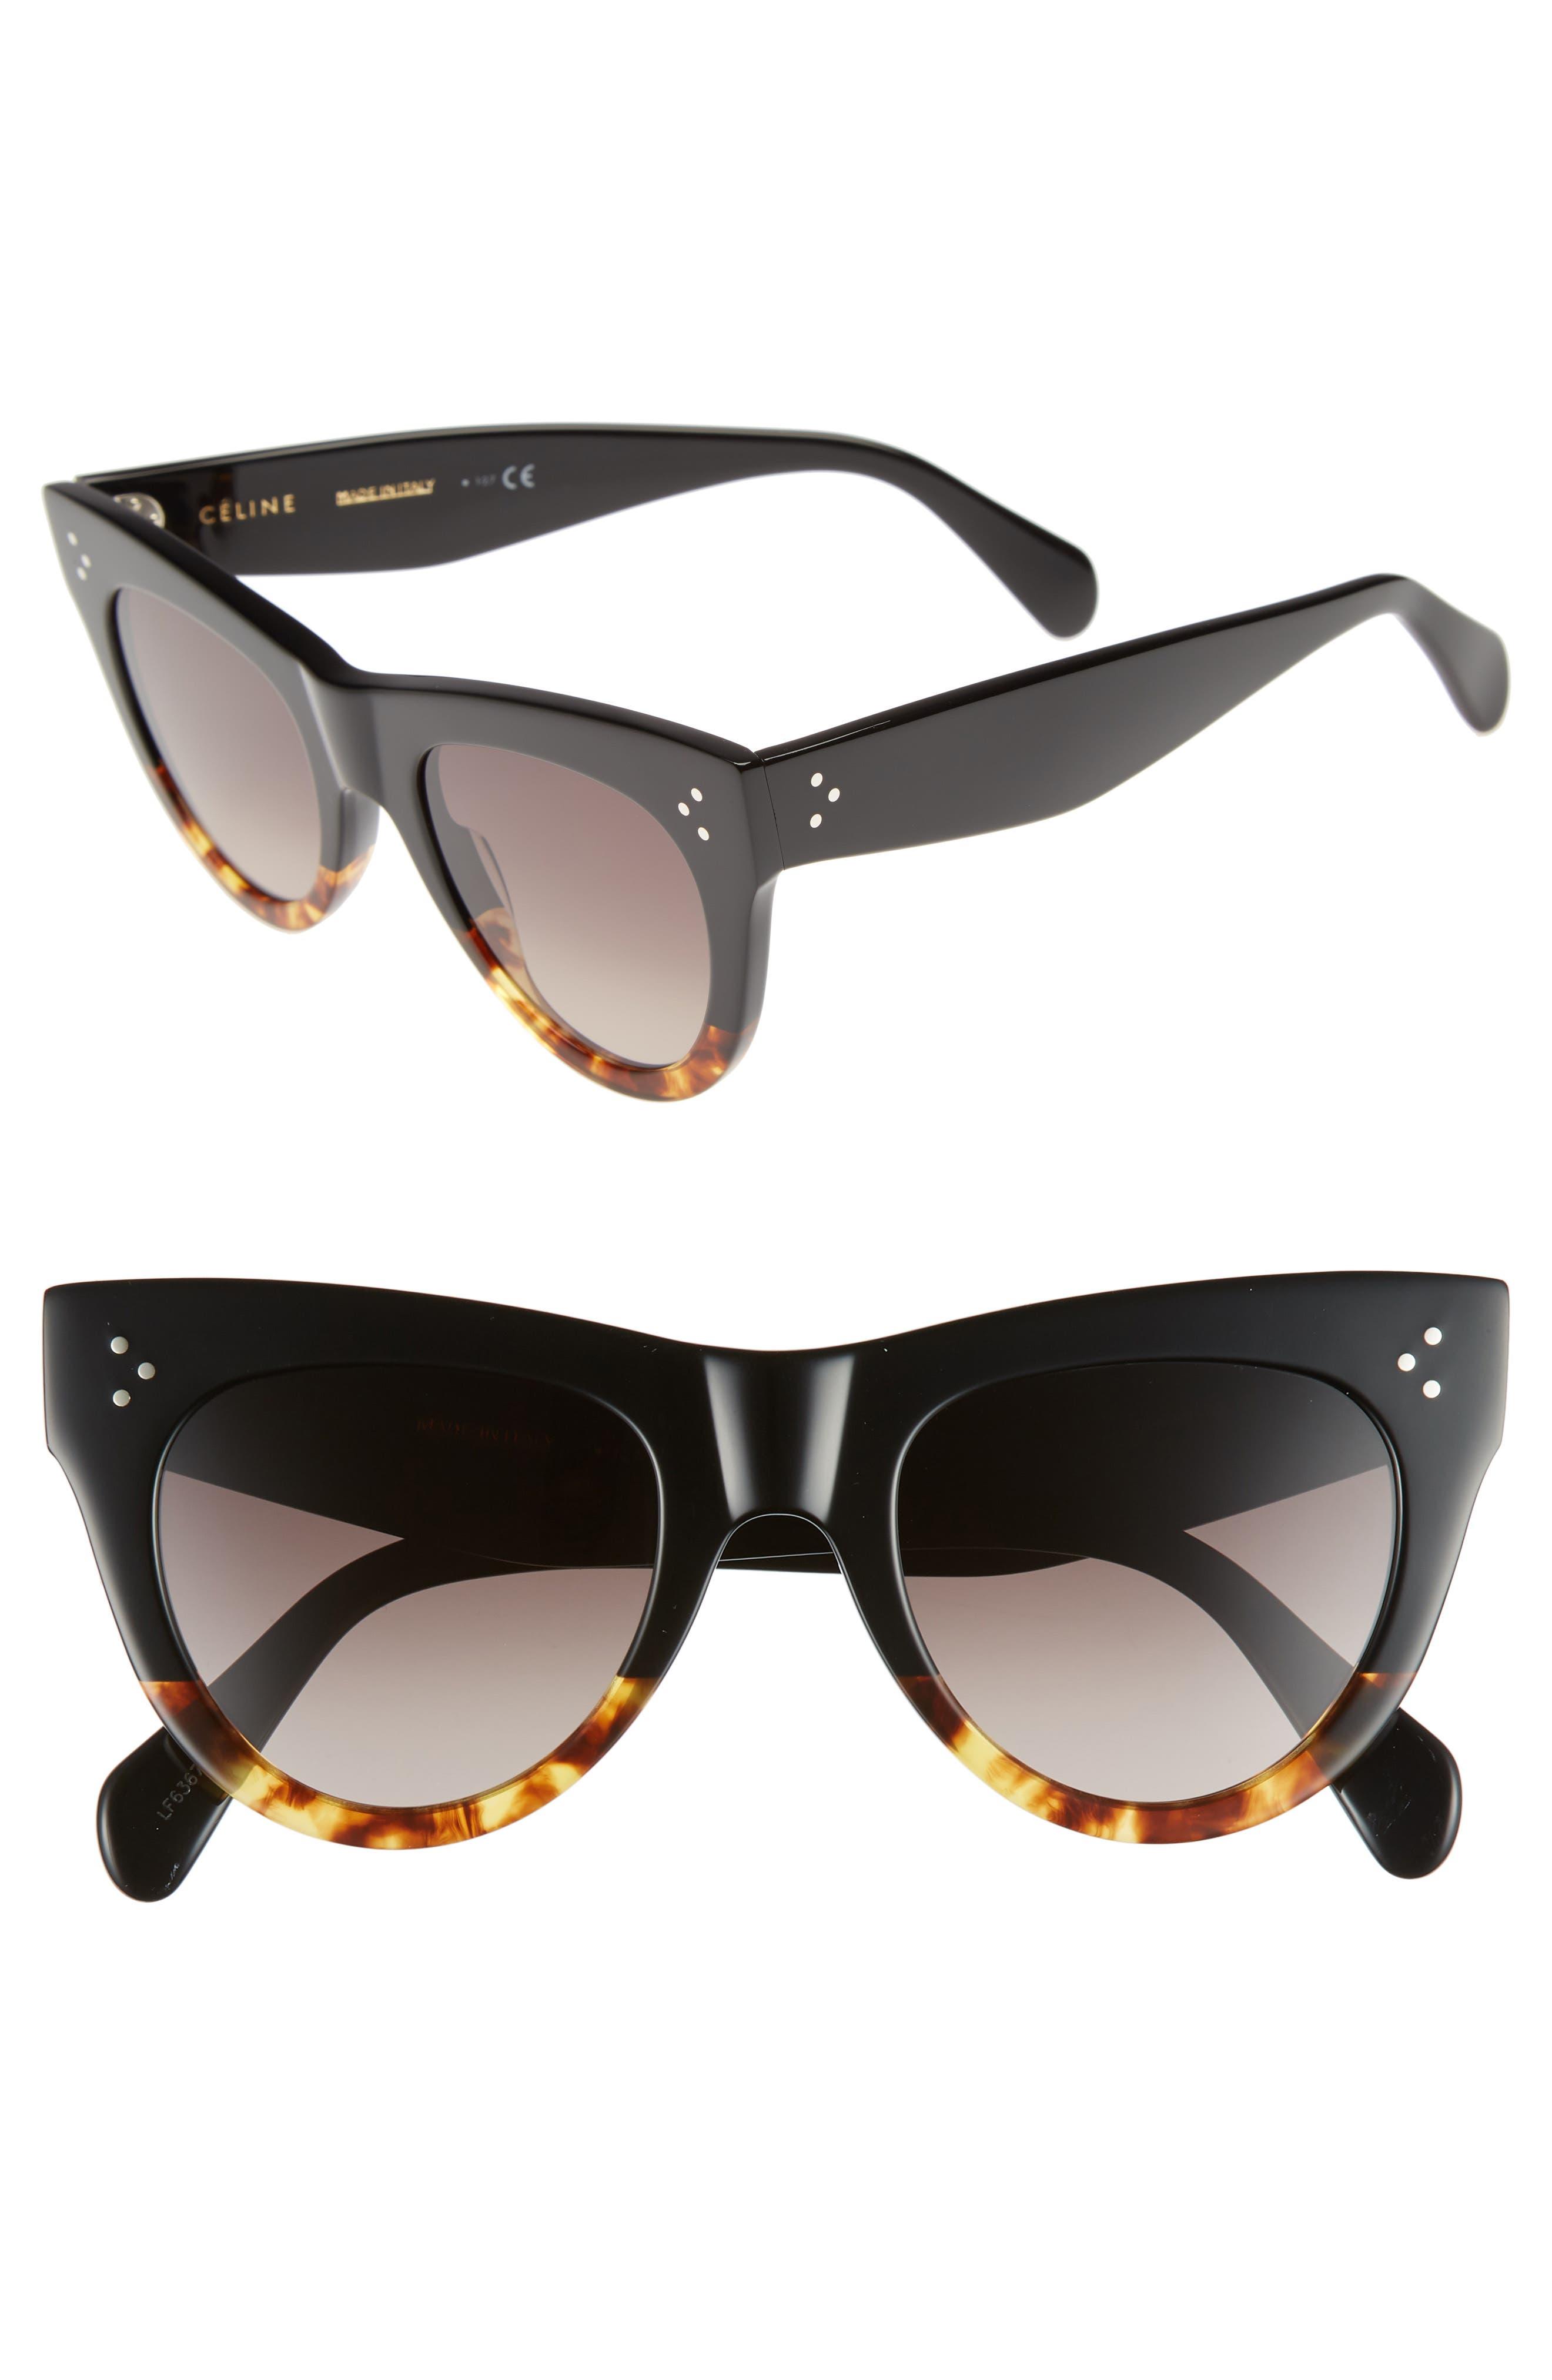 0a72683a83e CELINE Sunglasses  Audrey